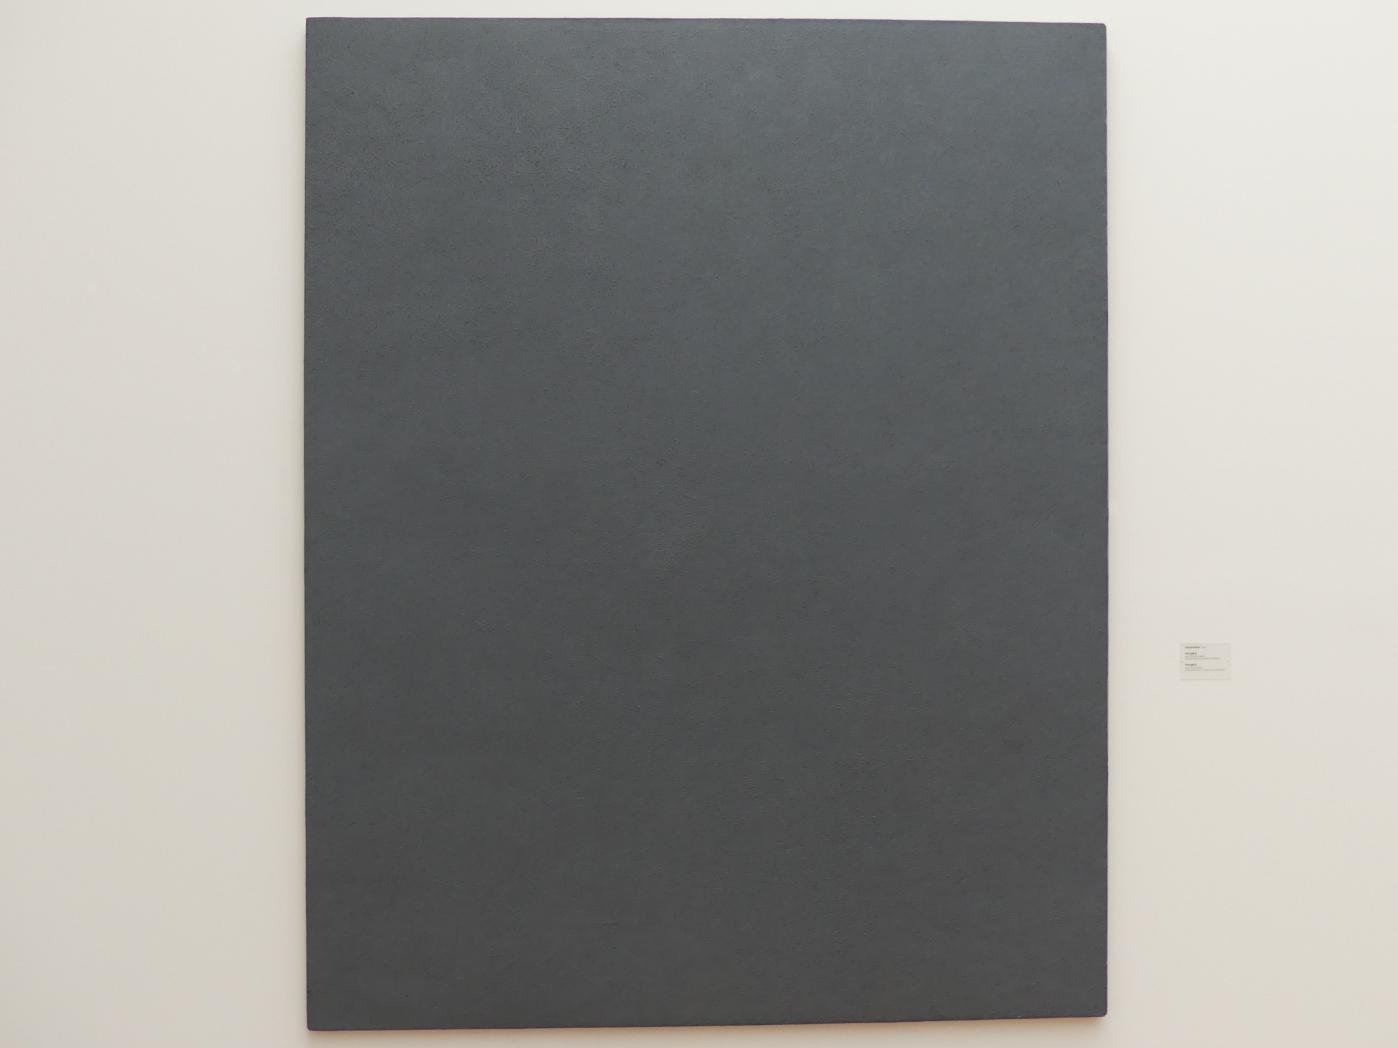 Gerhard Richter: Grau (348-3), 1973